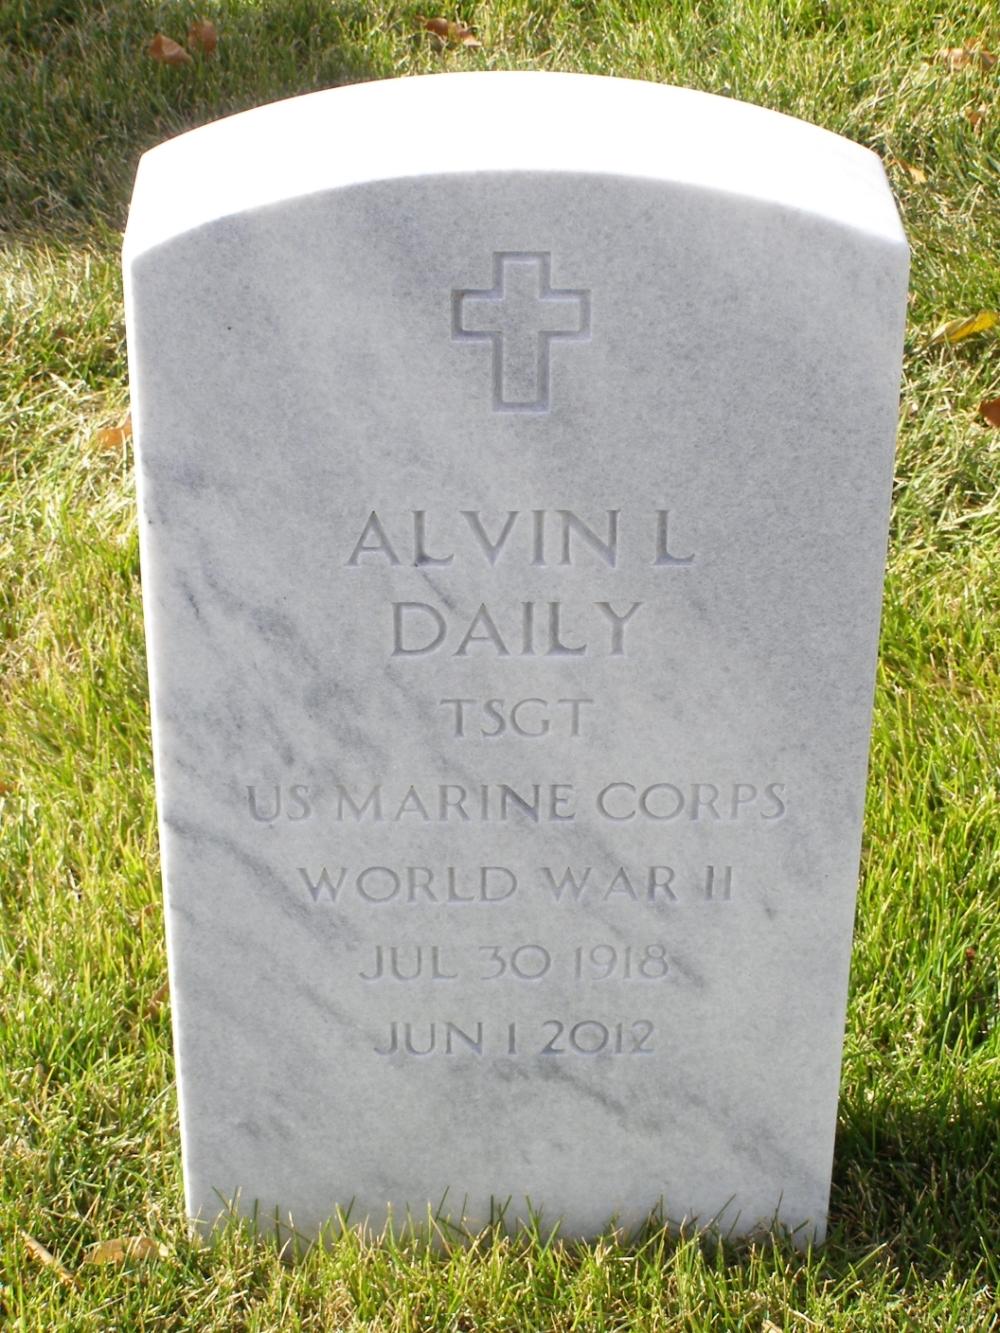 Alvin Leon Daily July 30, 1918 - June 1, 2012 Grave Marker